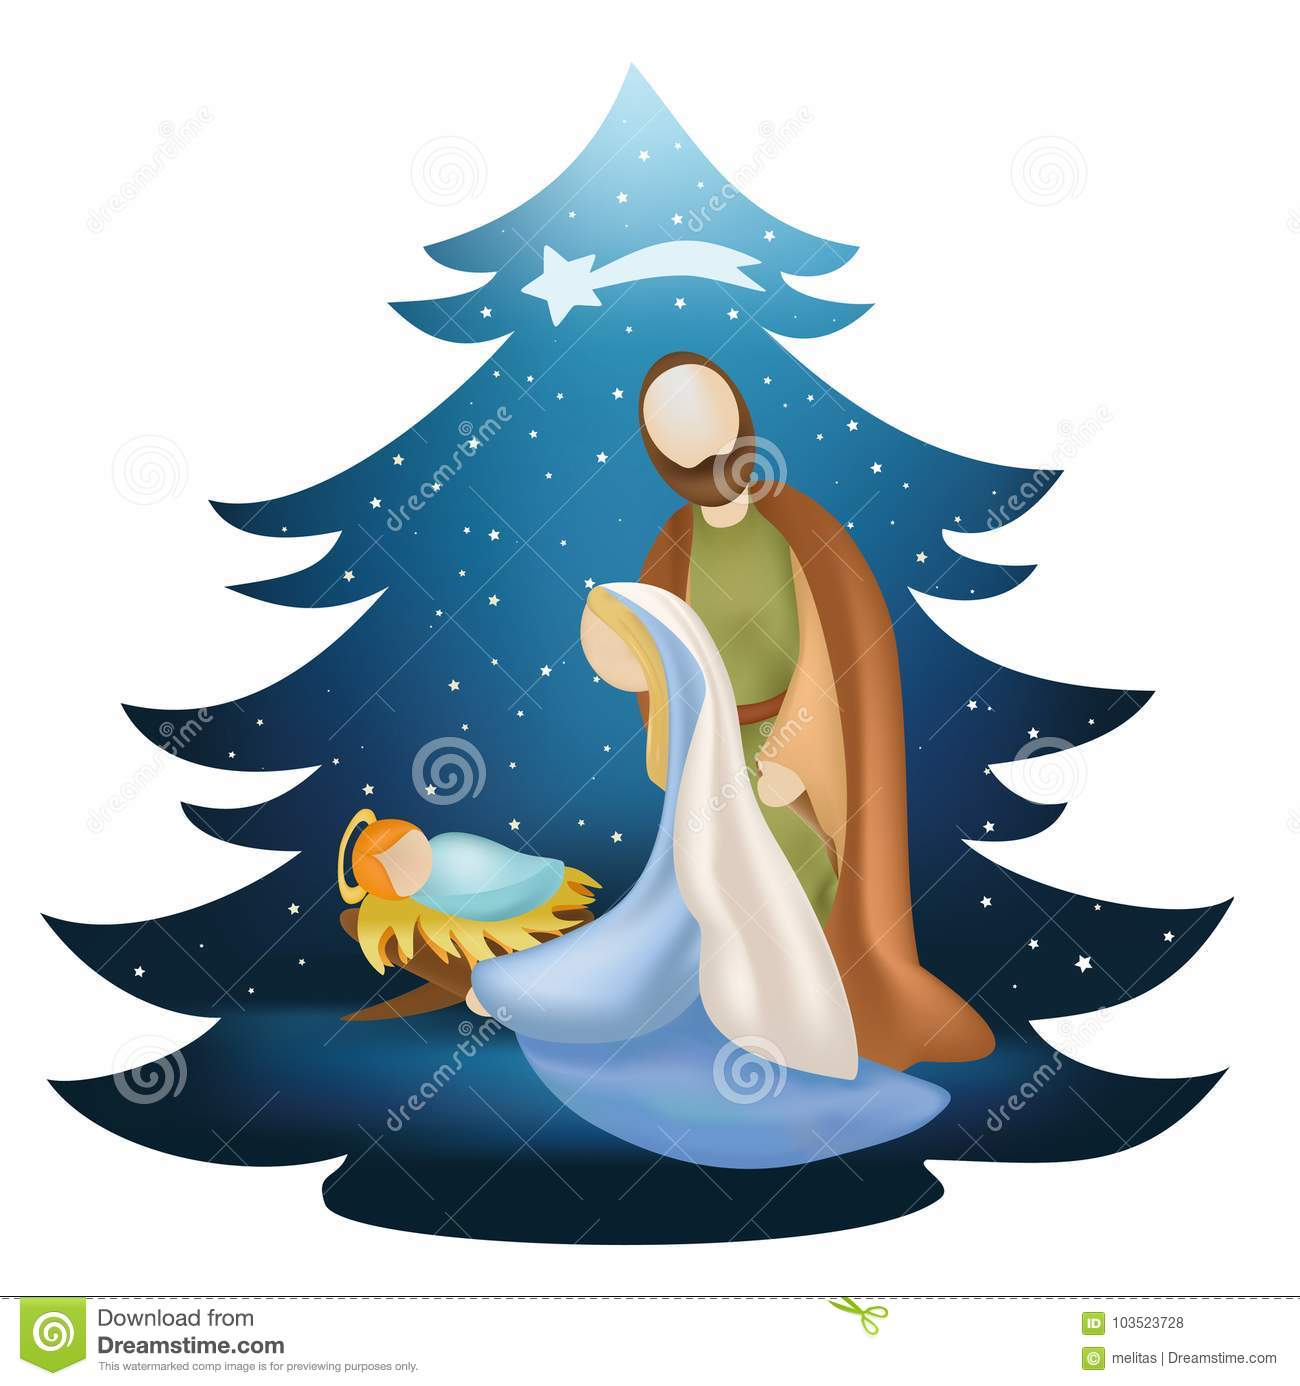 Christmas Tree Nativity Scene With Holy Family On Blue Background.